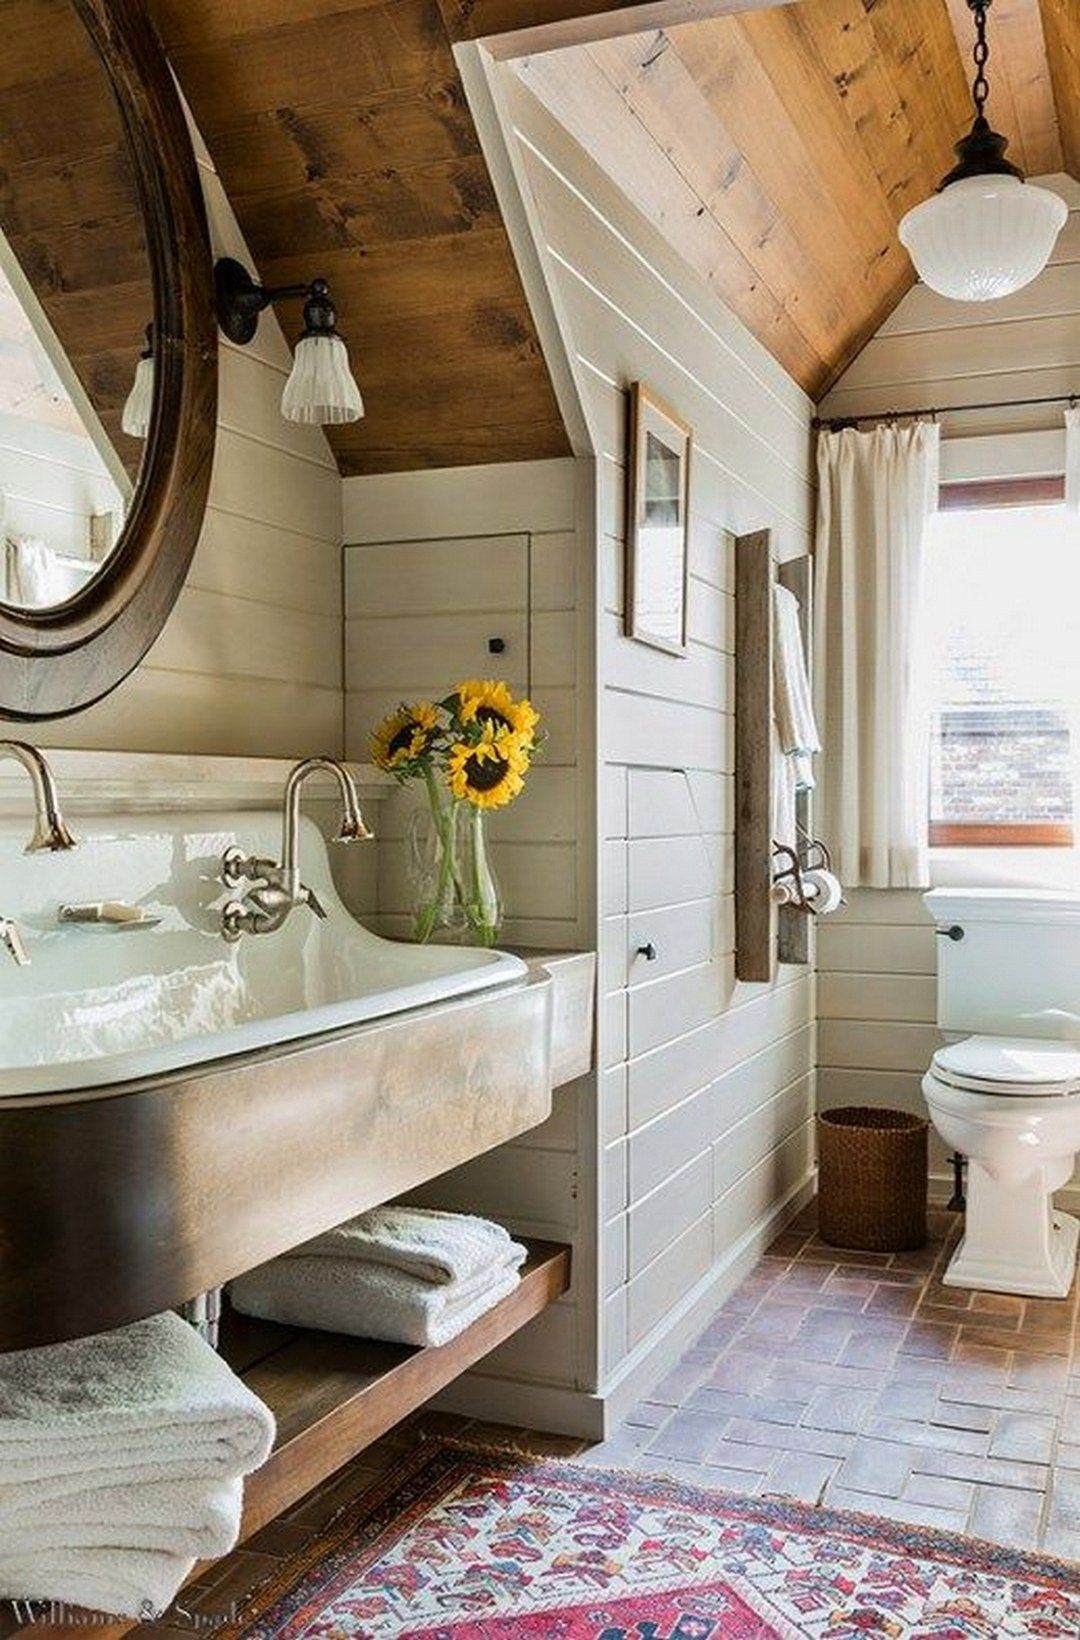 Pin by amanda mae carlock on dream house pinterest bathroom